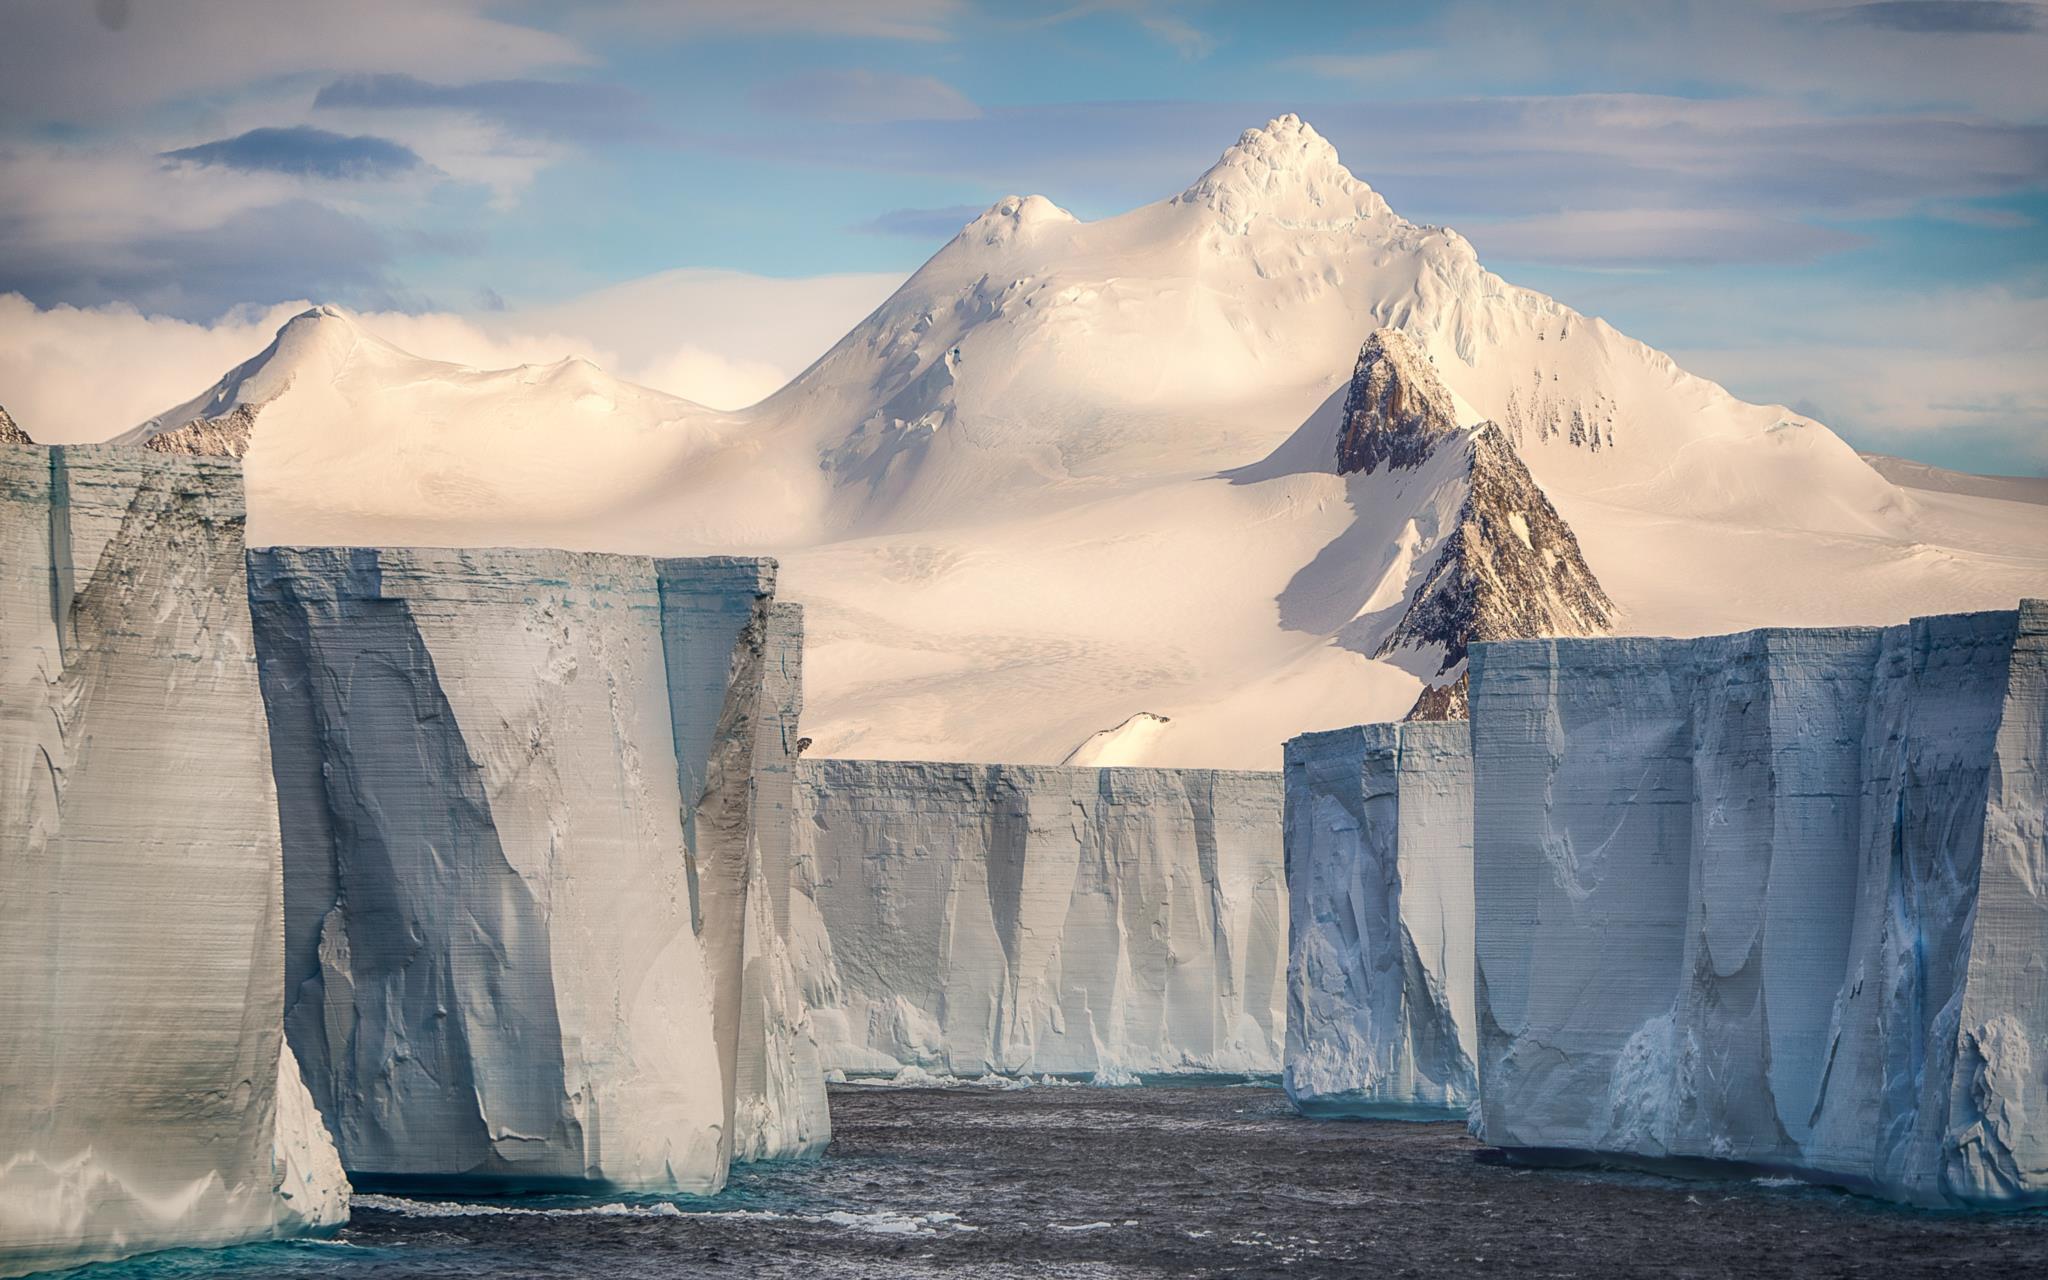 Península Antárctica (1.º prémio - França)